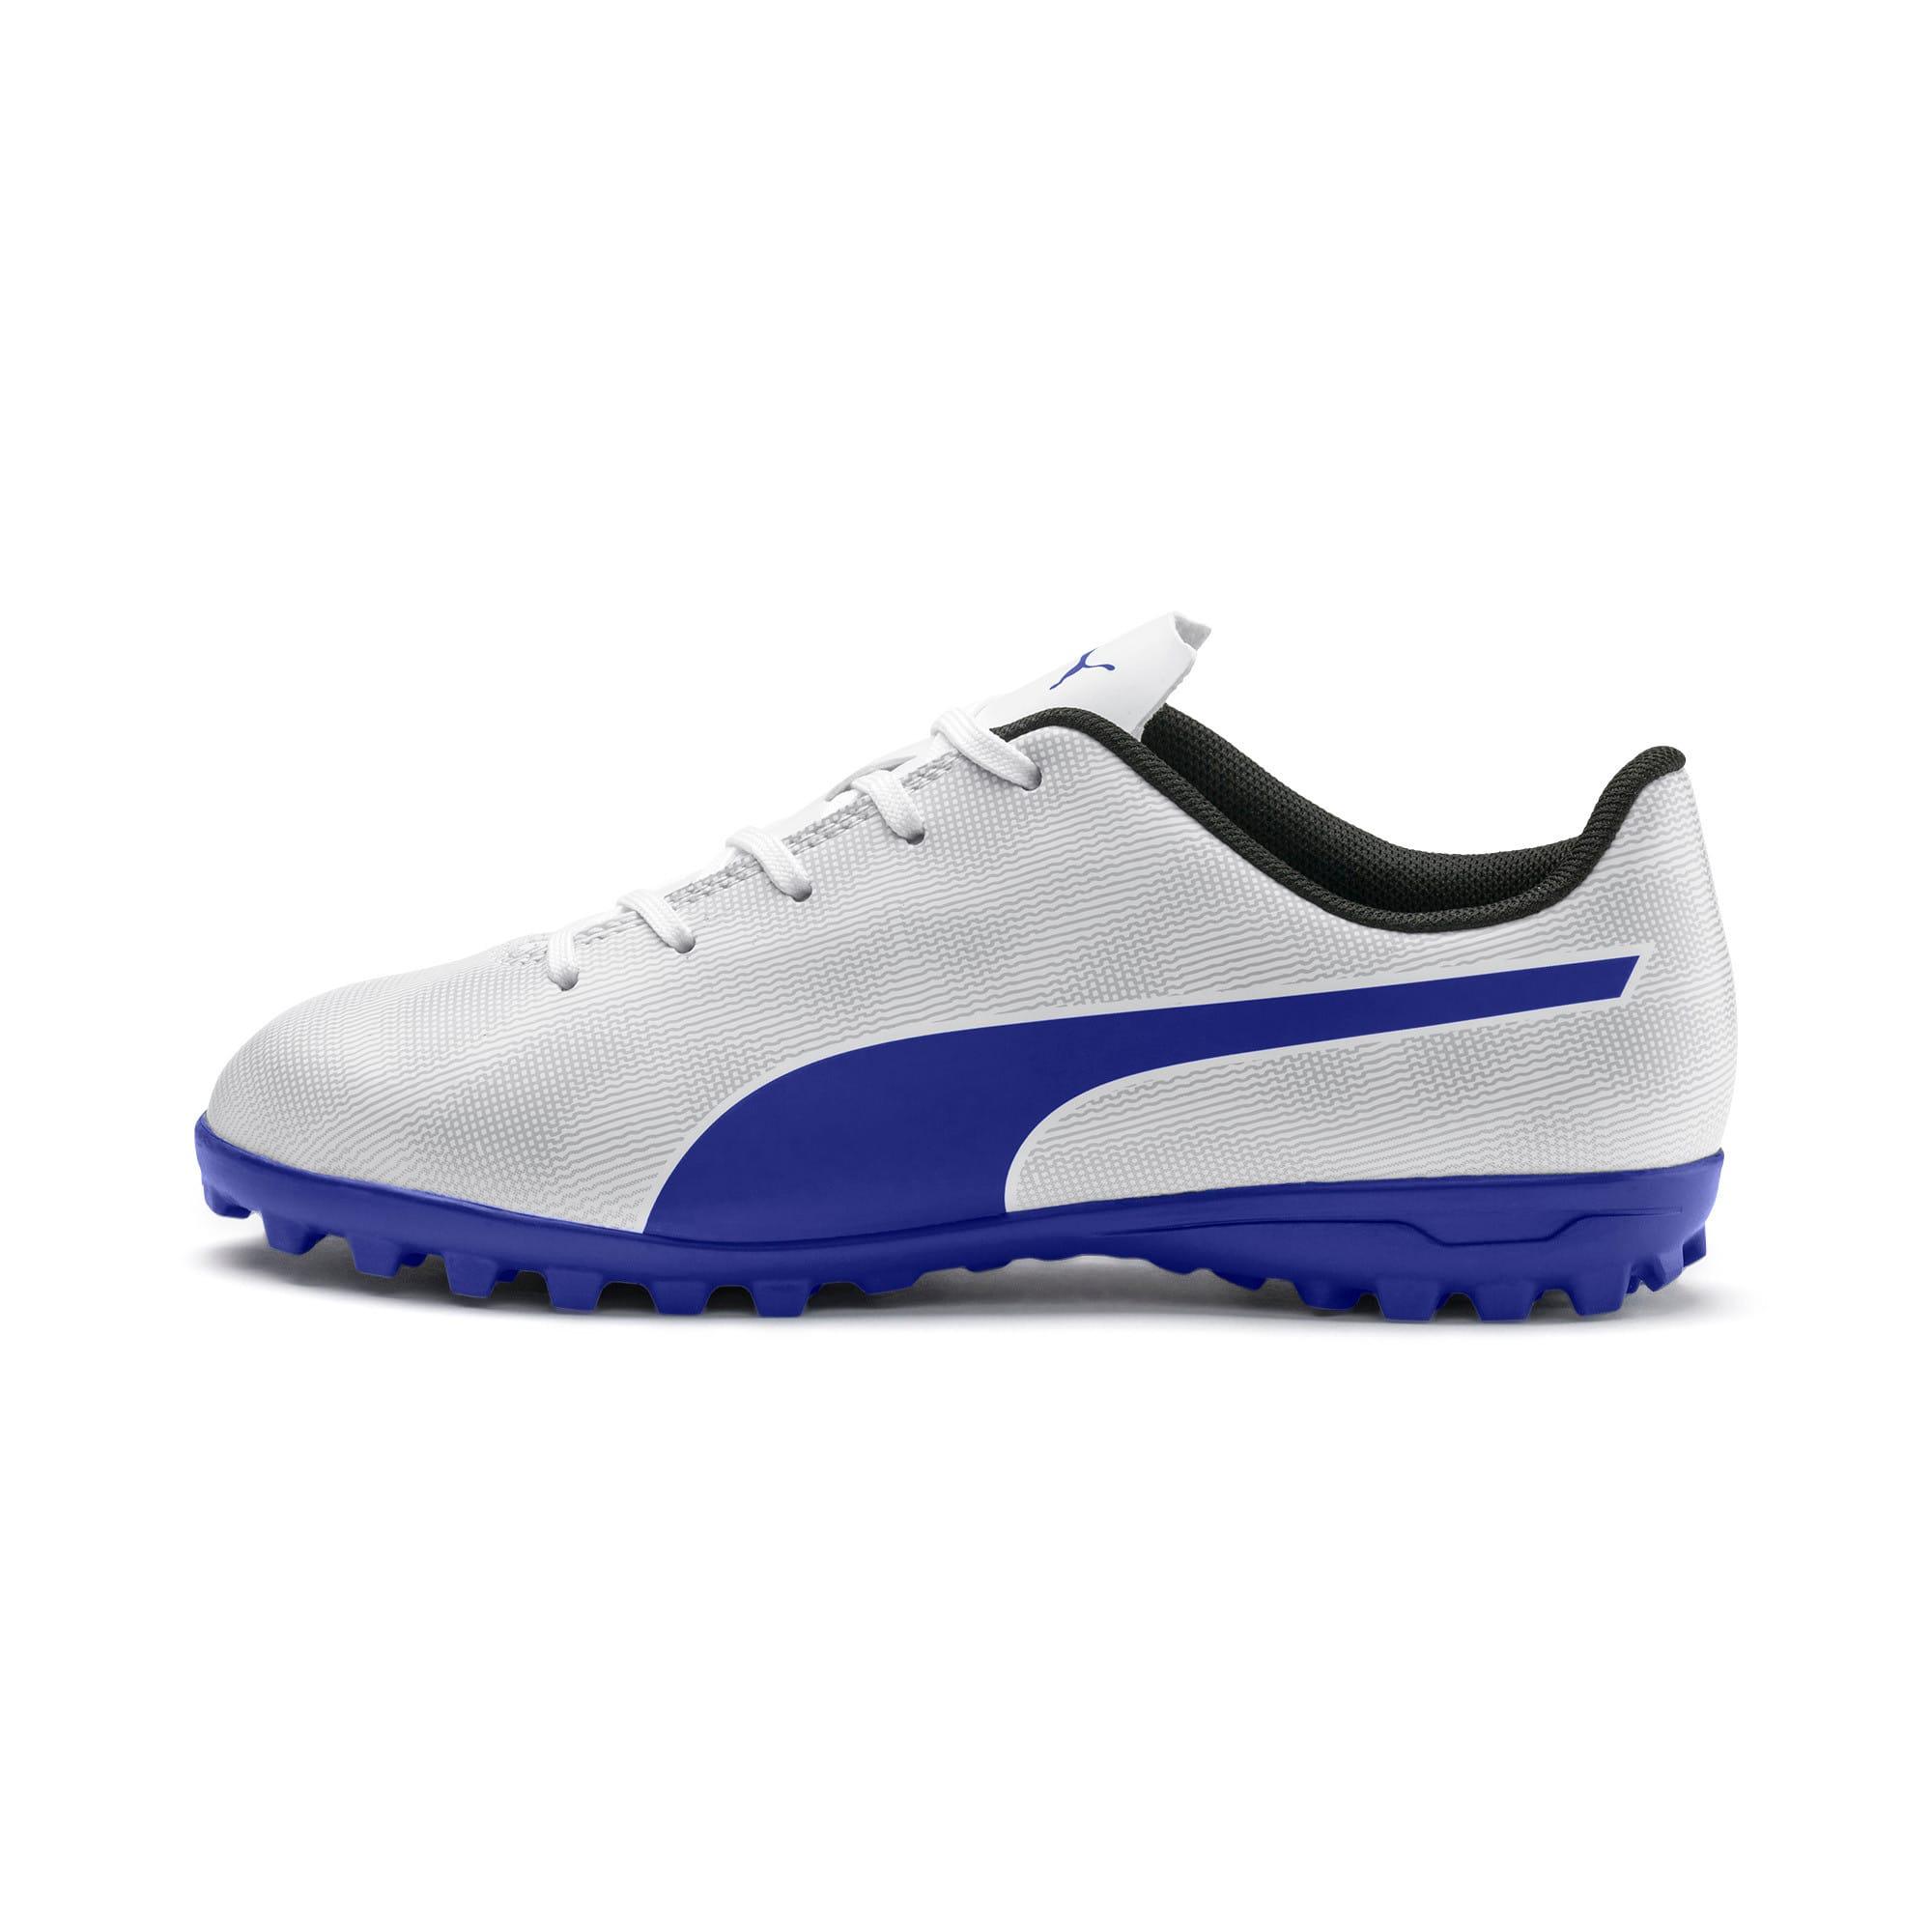 Thumbnail 1 of Rapido TT Boy's Soccer Cleats JR, White-Royal Blue-Light Gray, medium